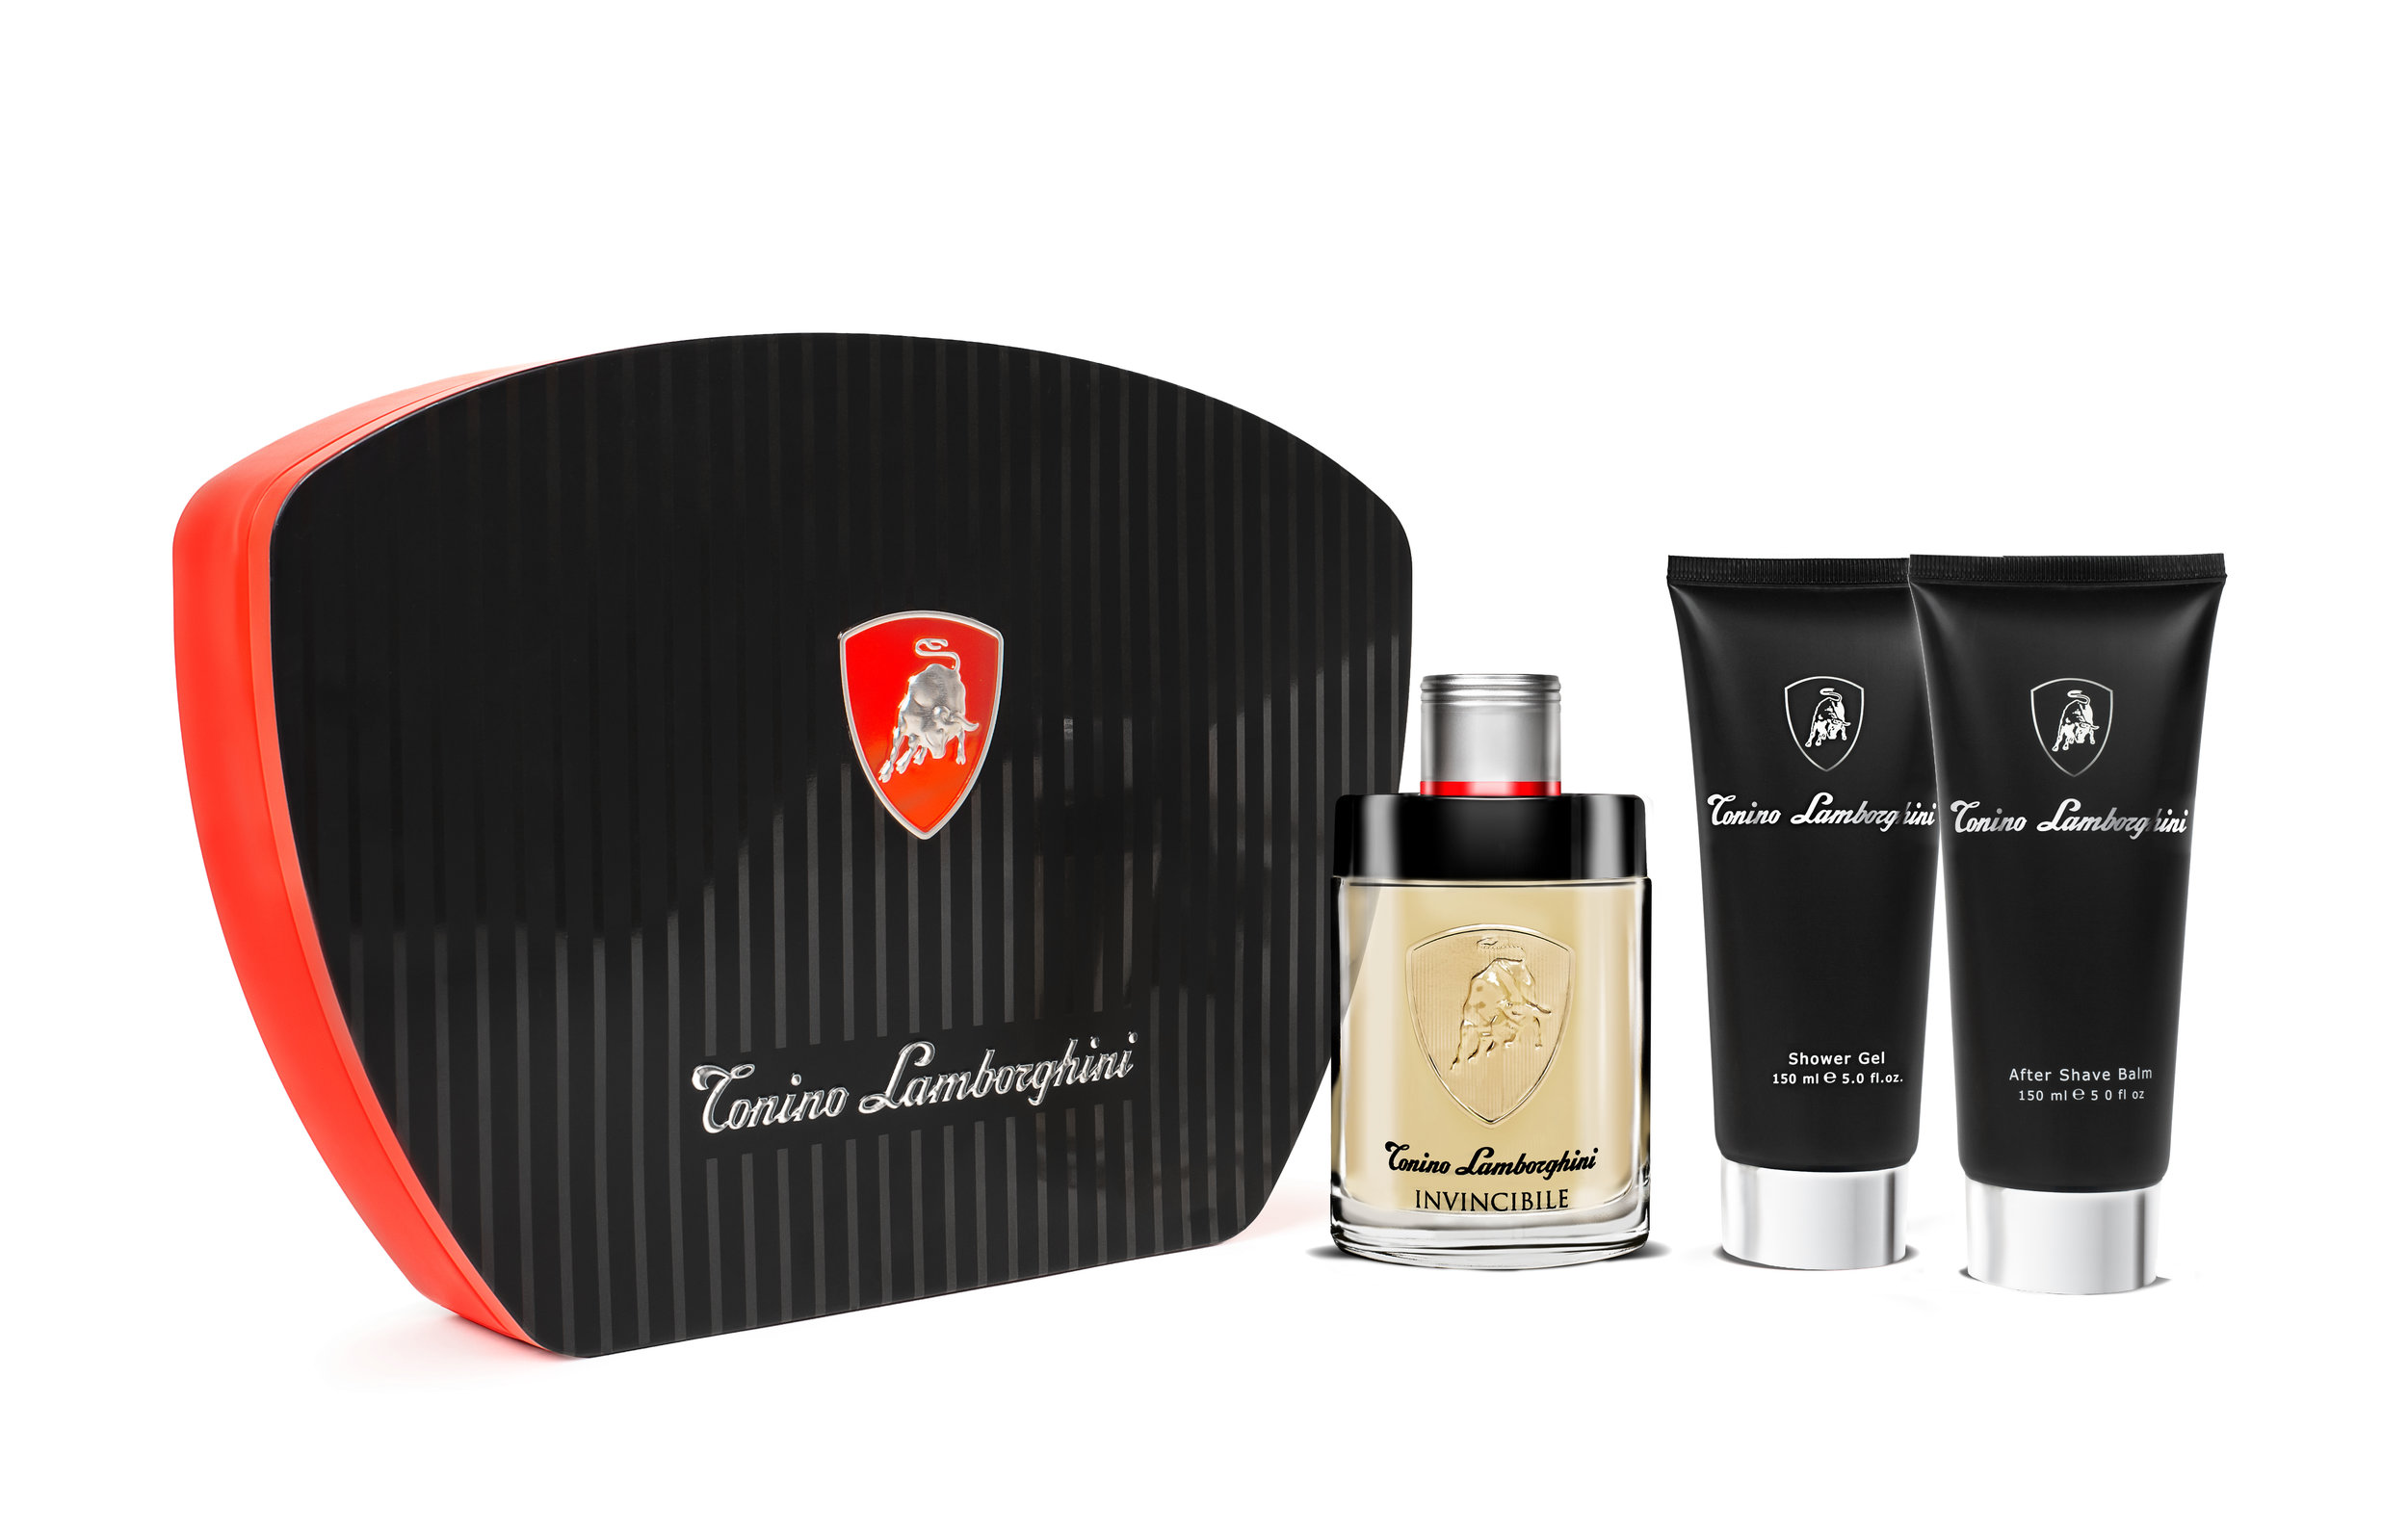 Tonino Lamborghini INVINCIBILE TIN Gift Set Edt 125ml / 4.2 fl. oz. + Shower Gel 150ml /5.0 fl.oz. + After Shave Balm 150ML / 5.0 fl. oz.